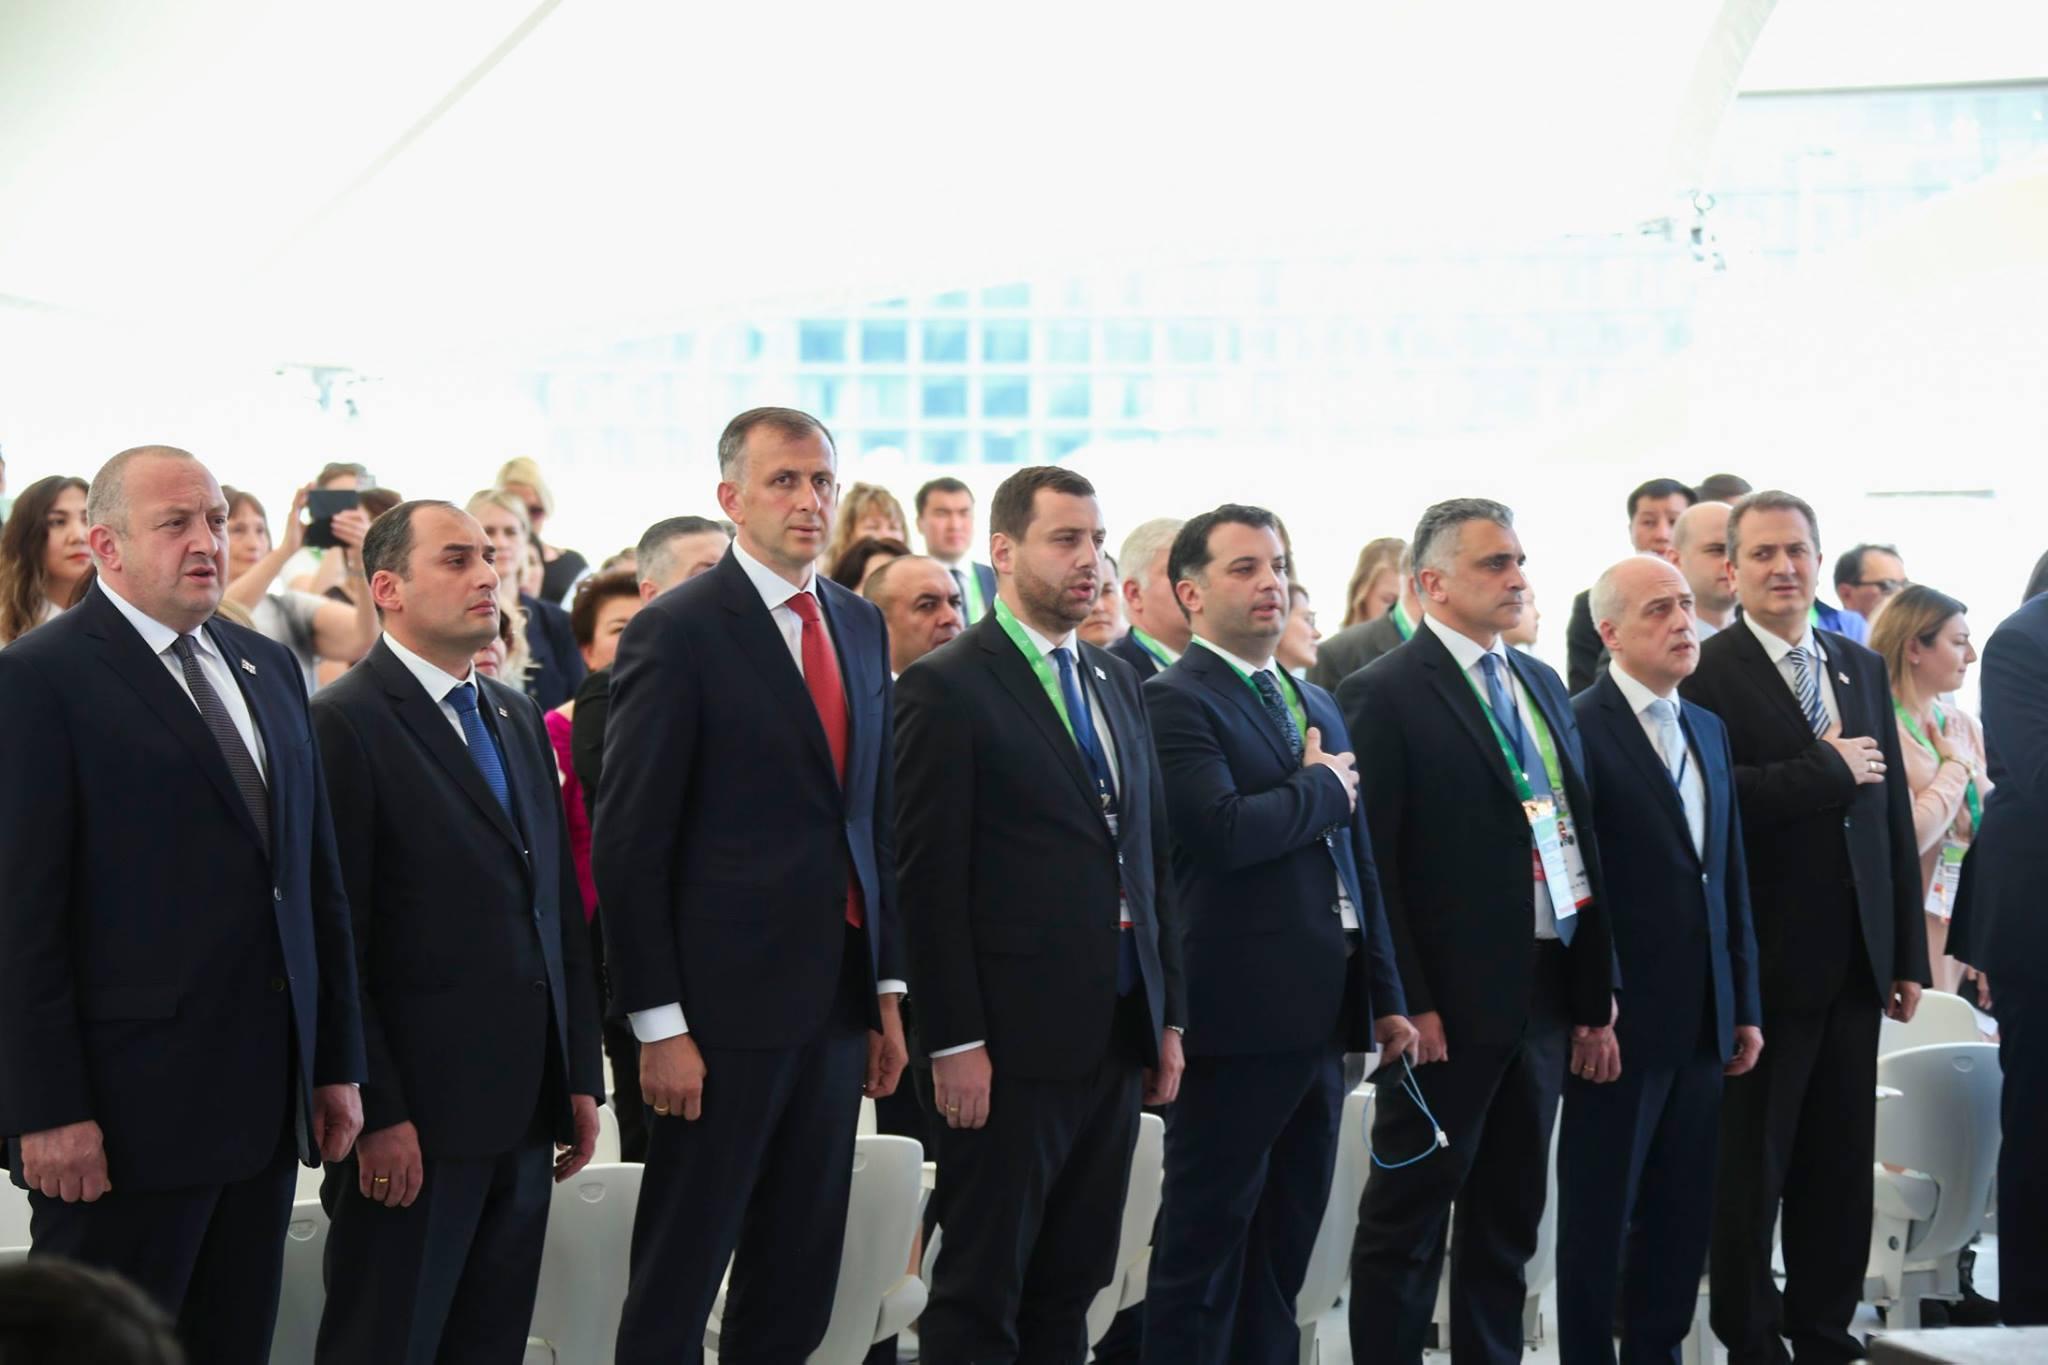 ",ASTANA EXPO-2017""- საქართველოს ეროვნული დღის აღნიშვნა"